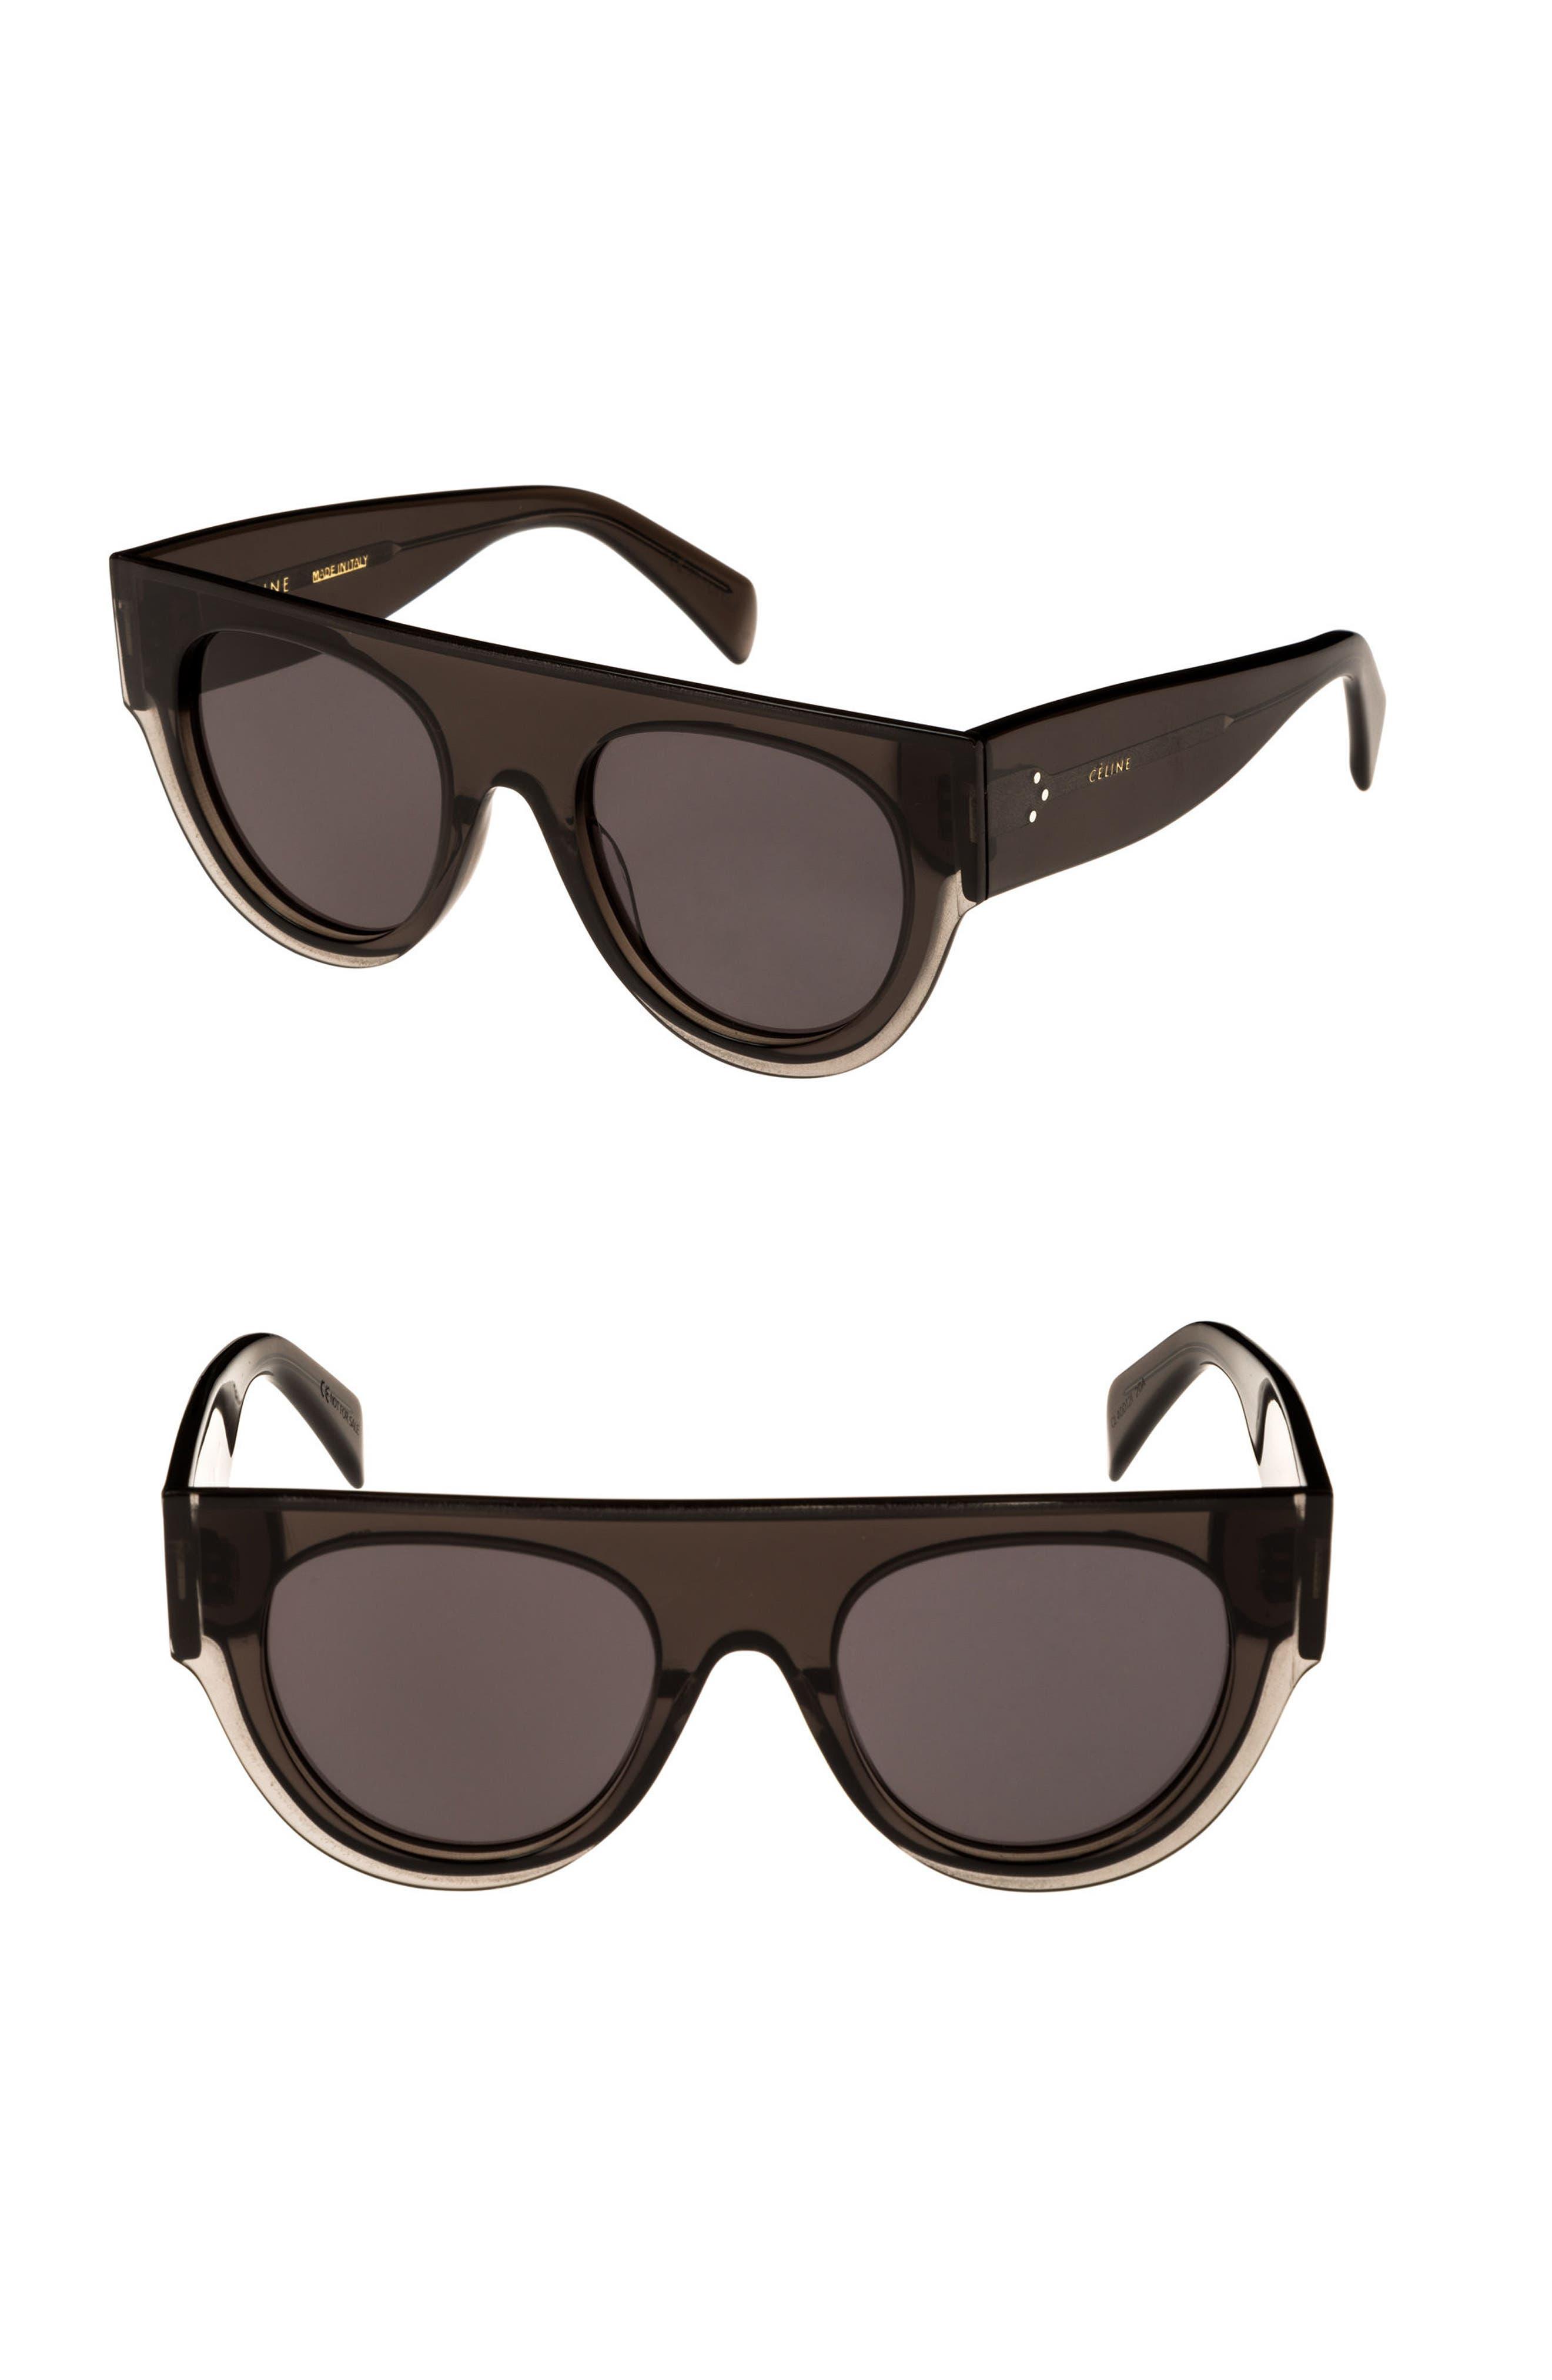 51mm Pilot Sunglasses,                         Main,                         color, DARK GREY/ SMOKE